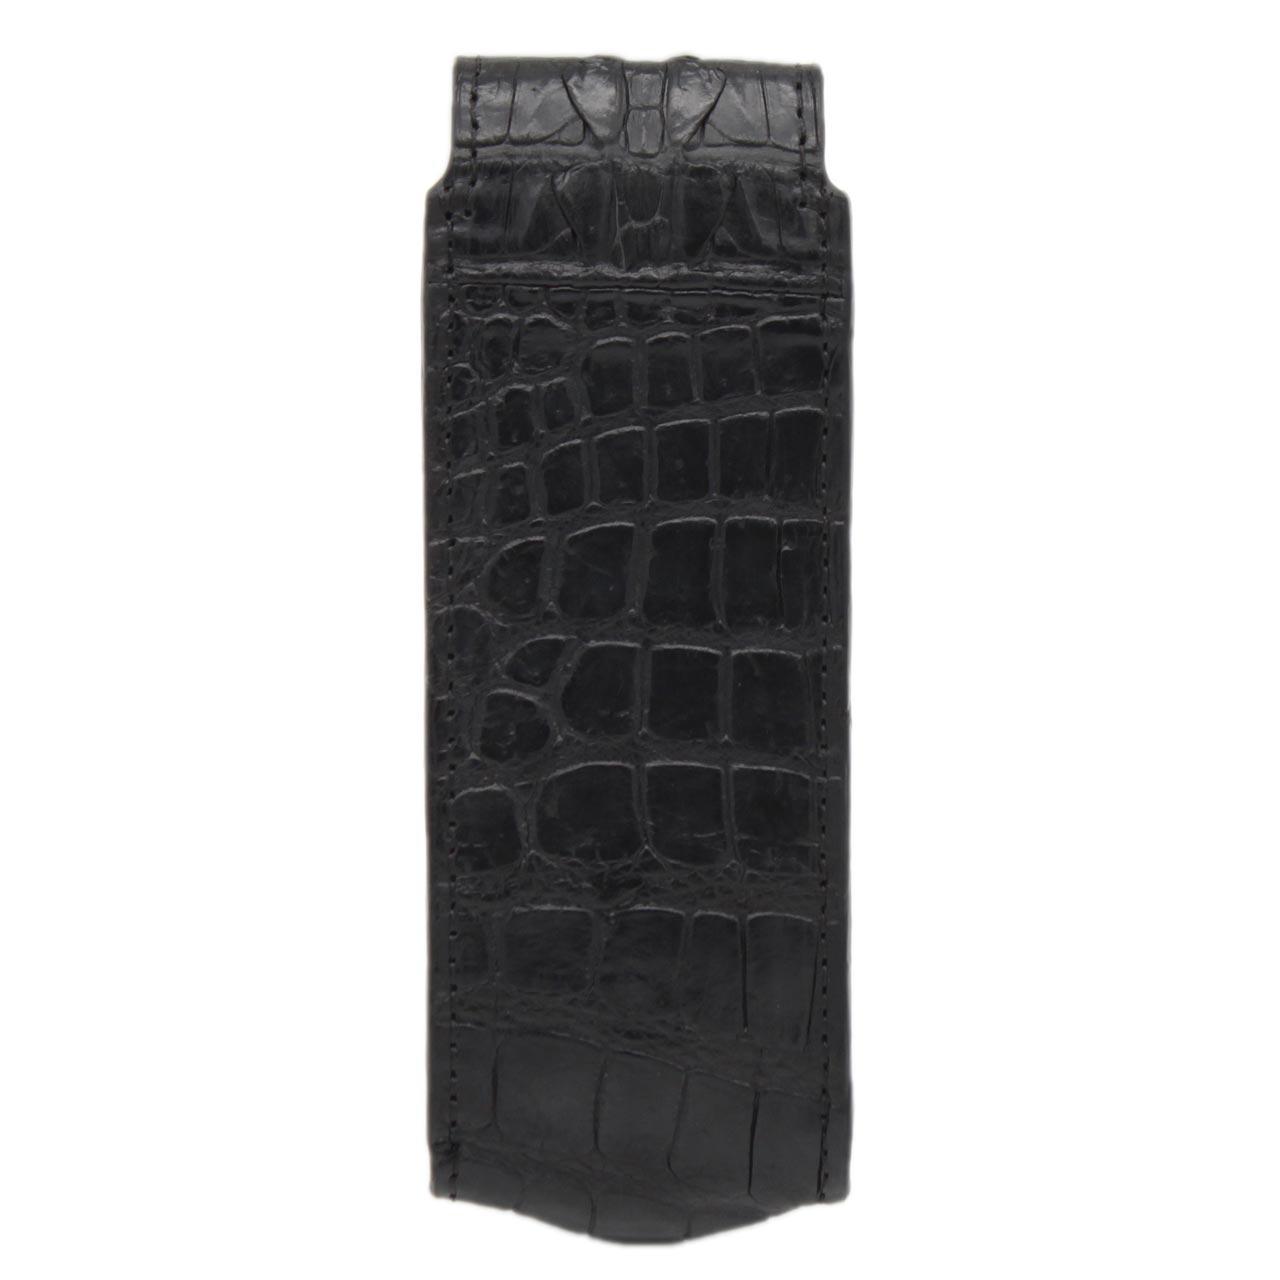 Crocodile leather Vertu phone case S1021a